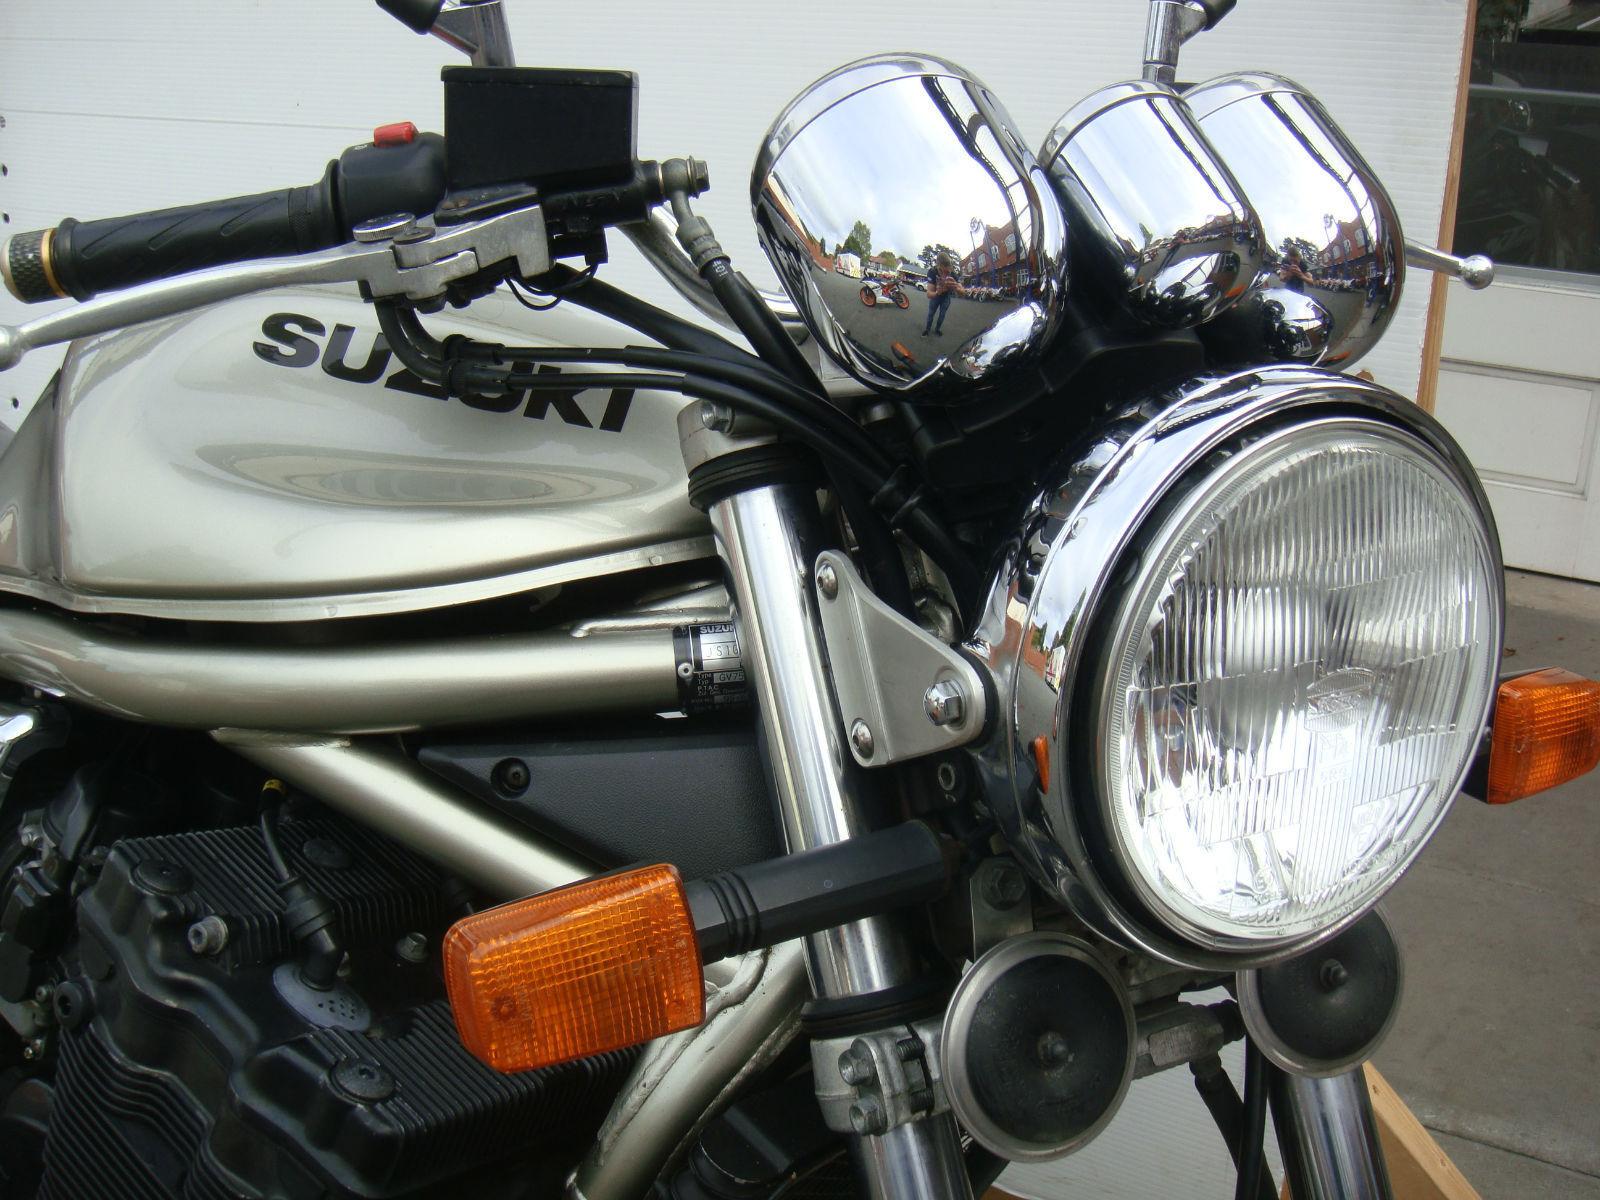 2000 Suzuki GSF 1200 N Bandit - Moto.ZombDrive.COM